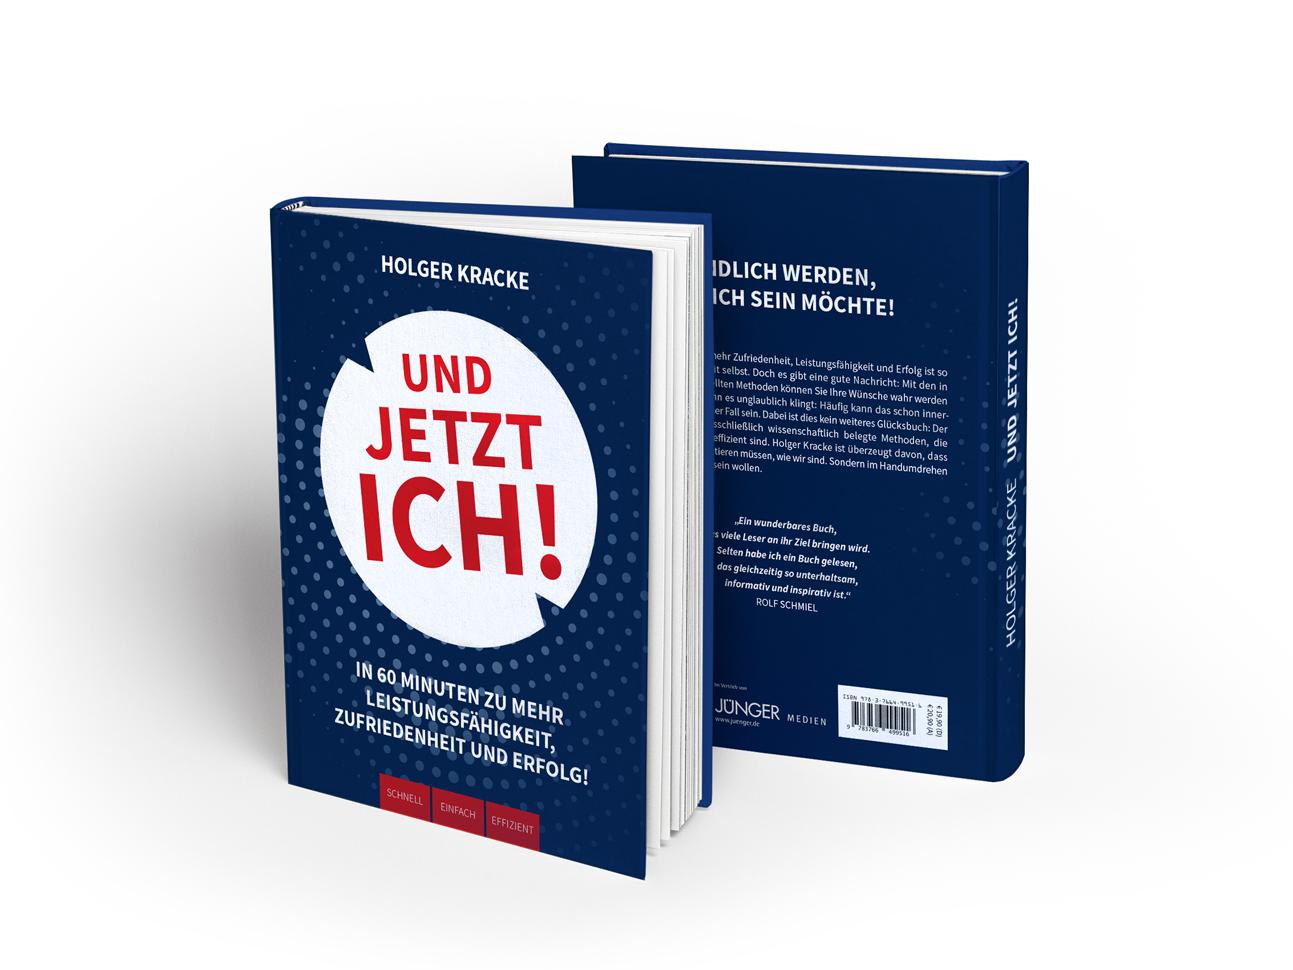 martin_zech_design_buchcover_self-publishing_holger-kracke_und-jetzt-ich